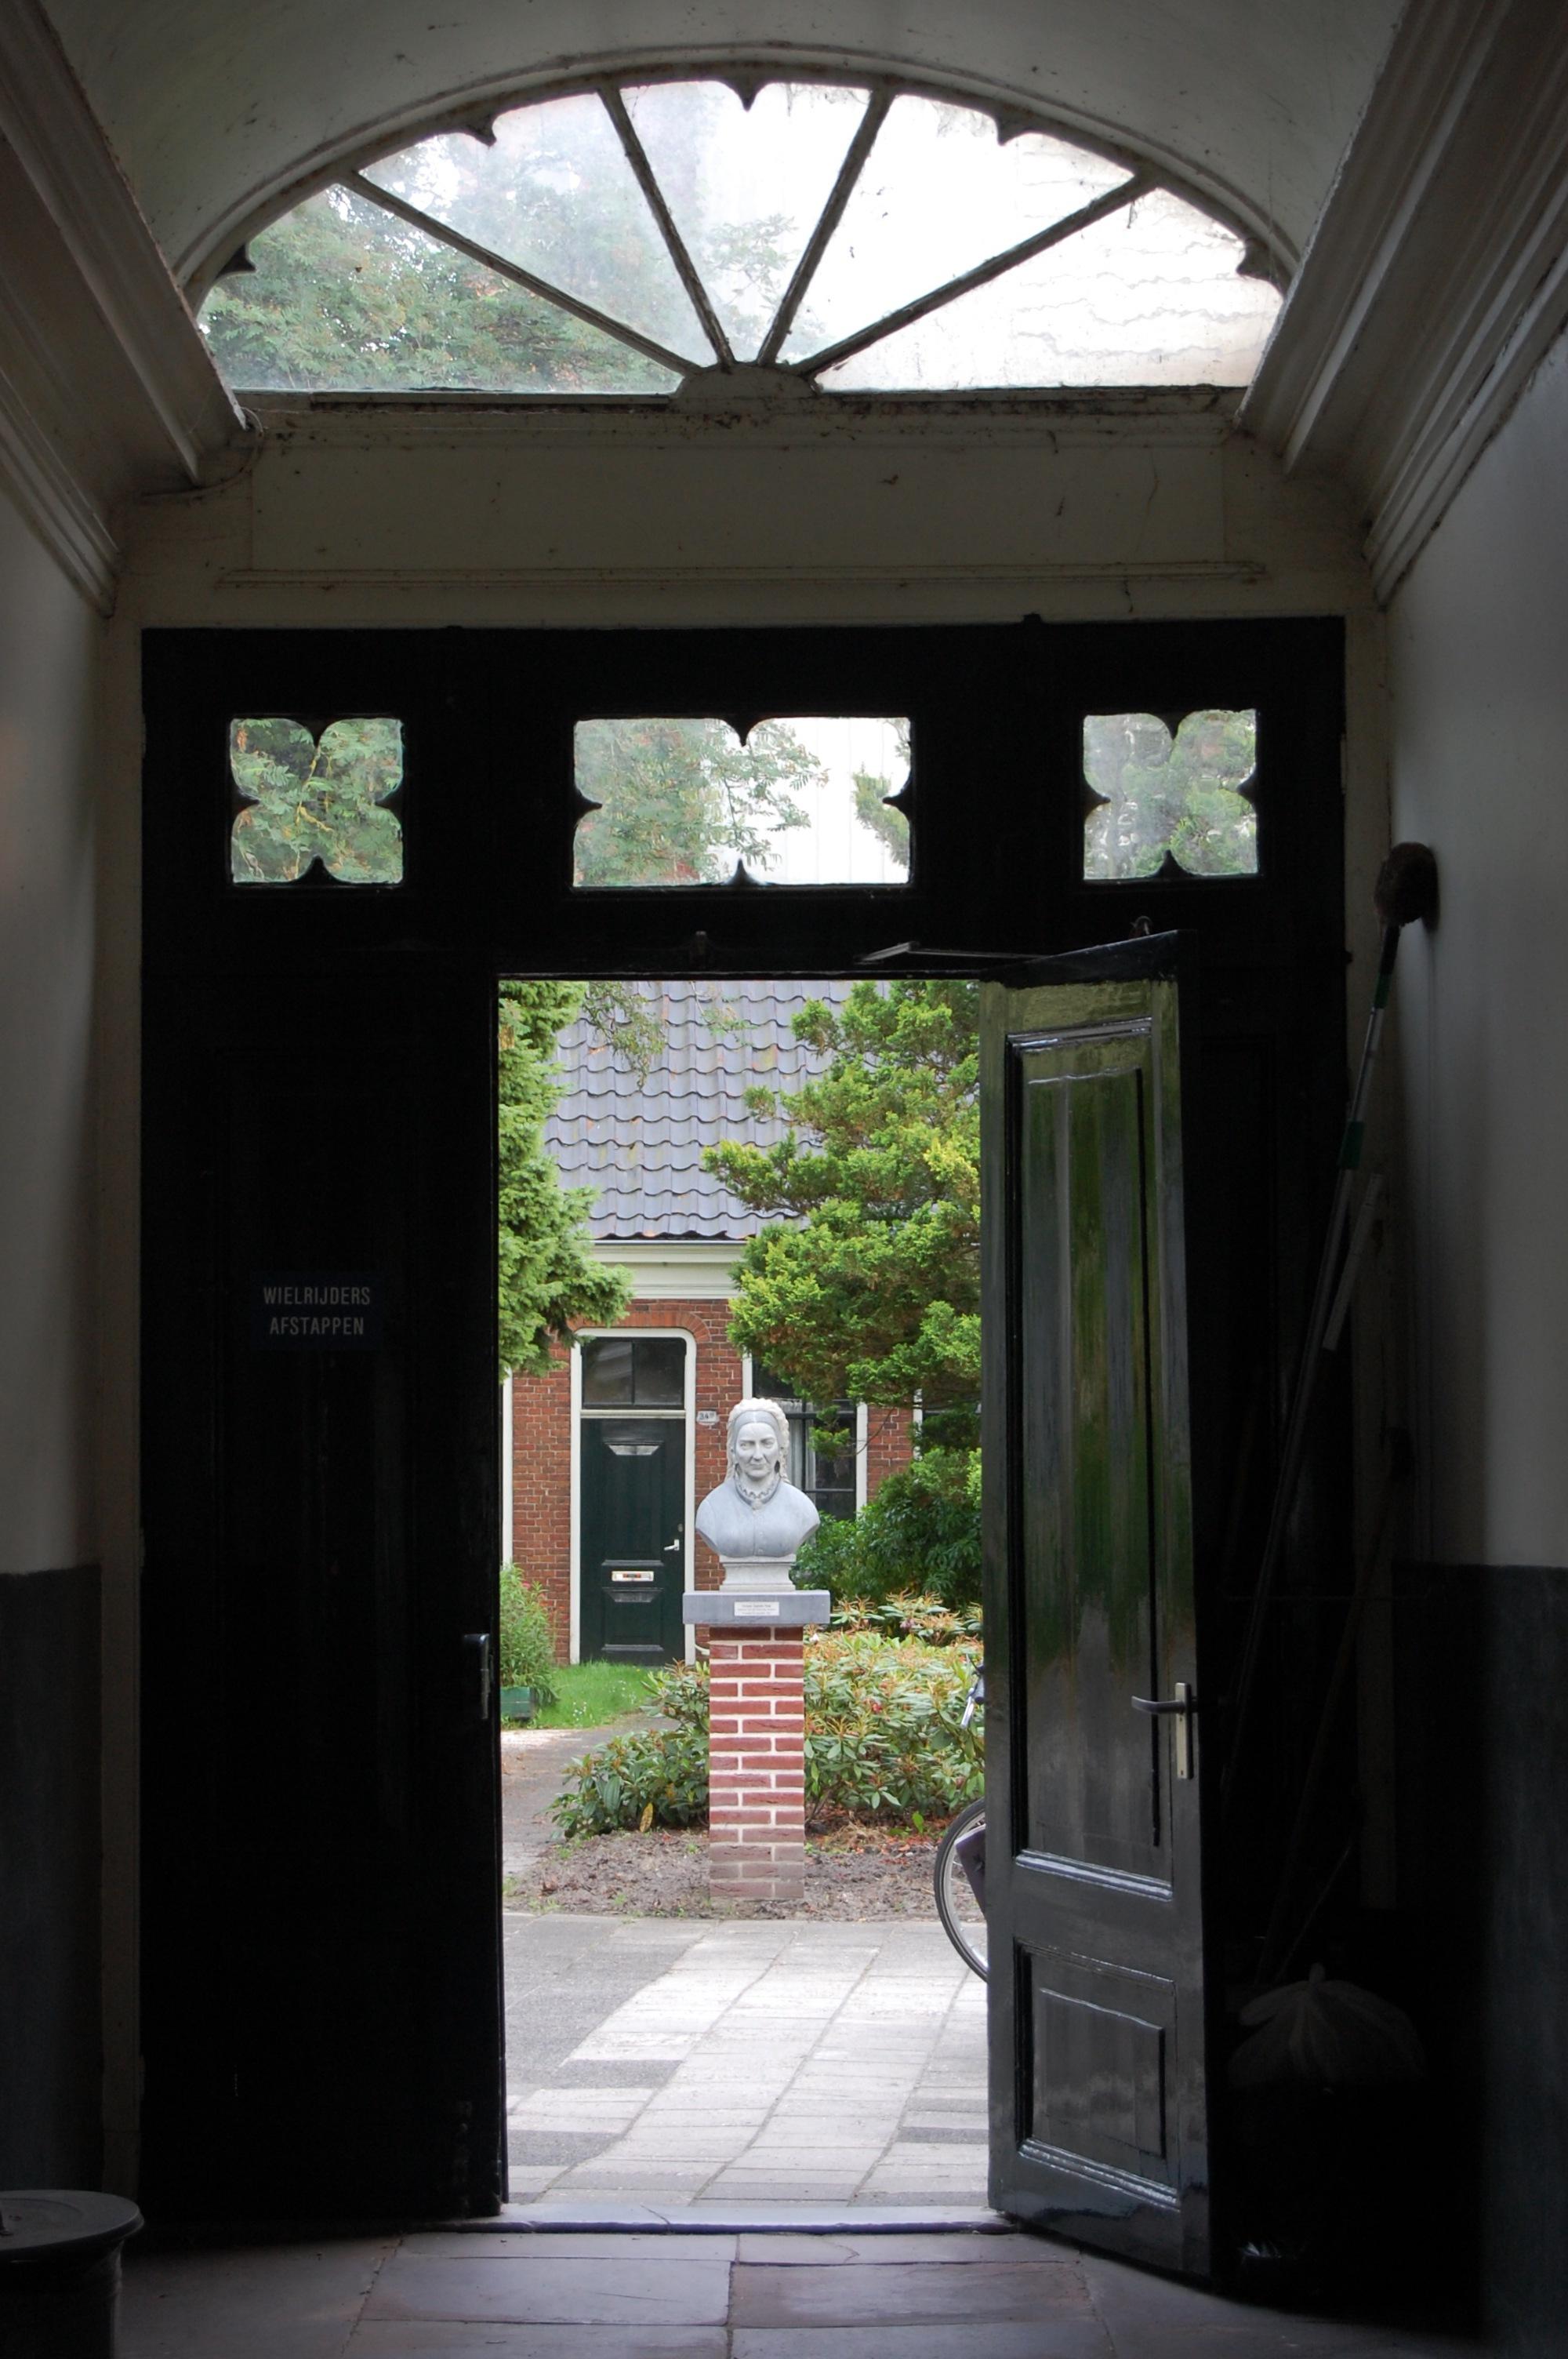 Pieternellagsthuis poort